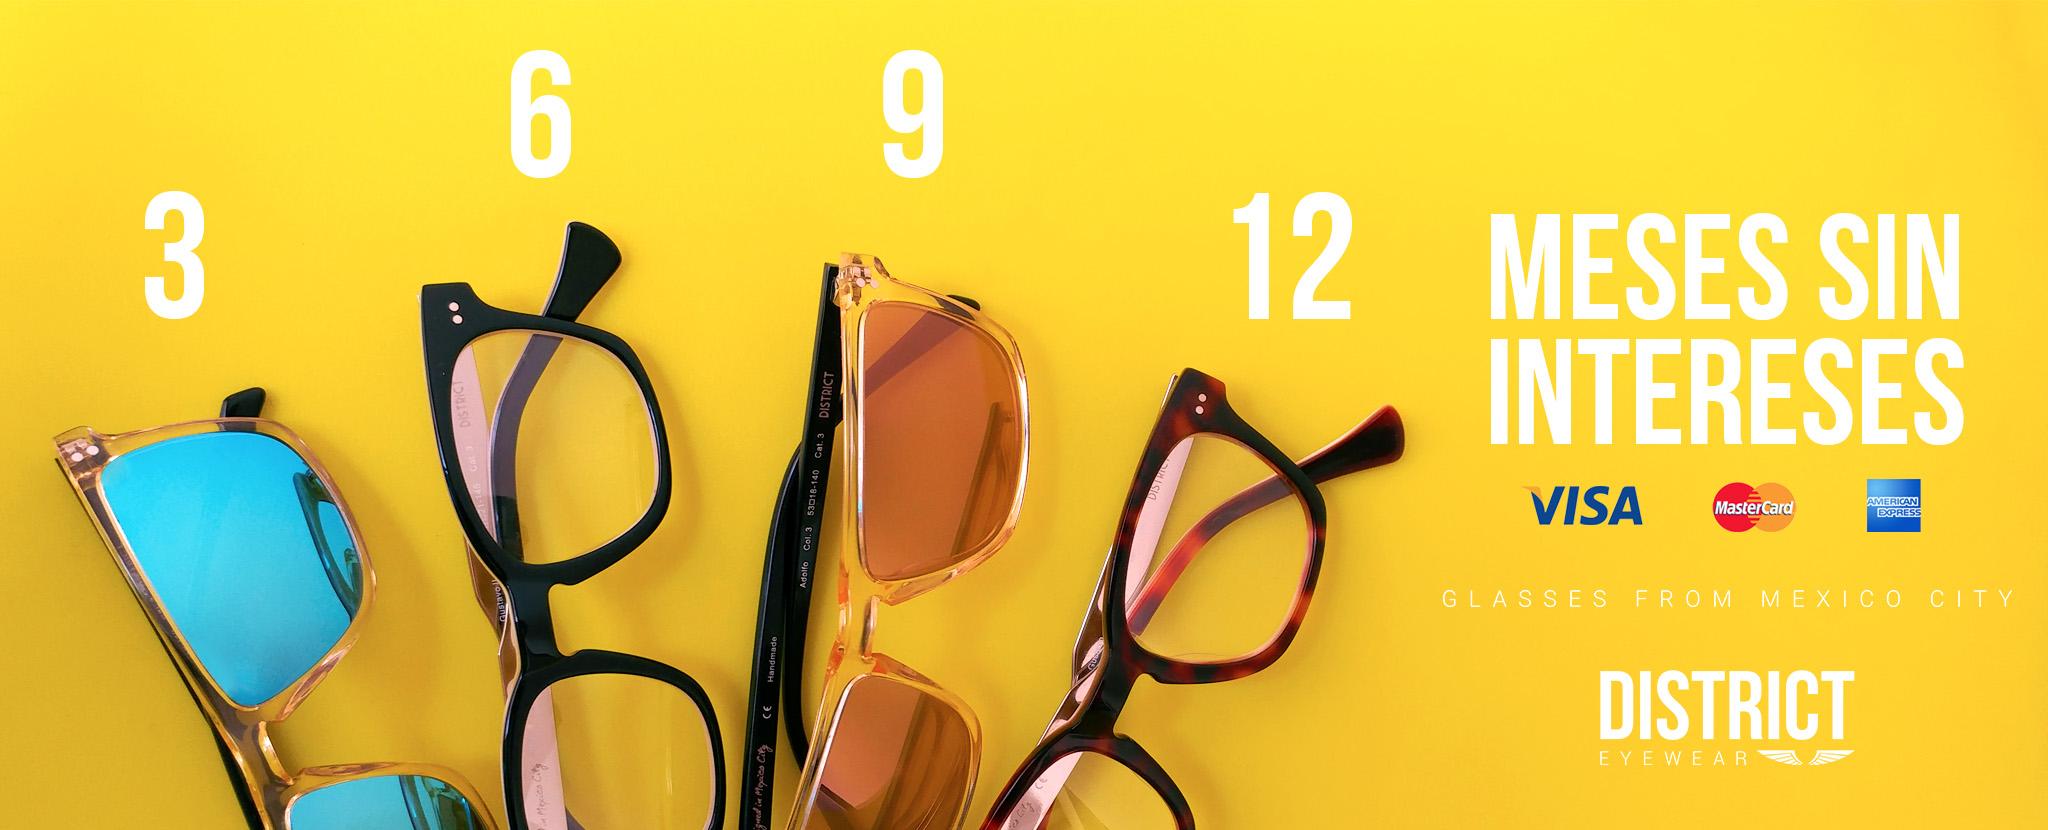 districteyewear, District Eyewear